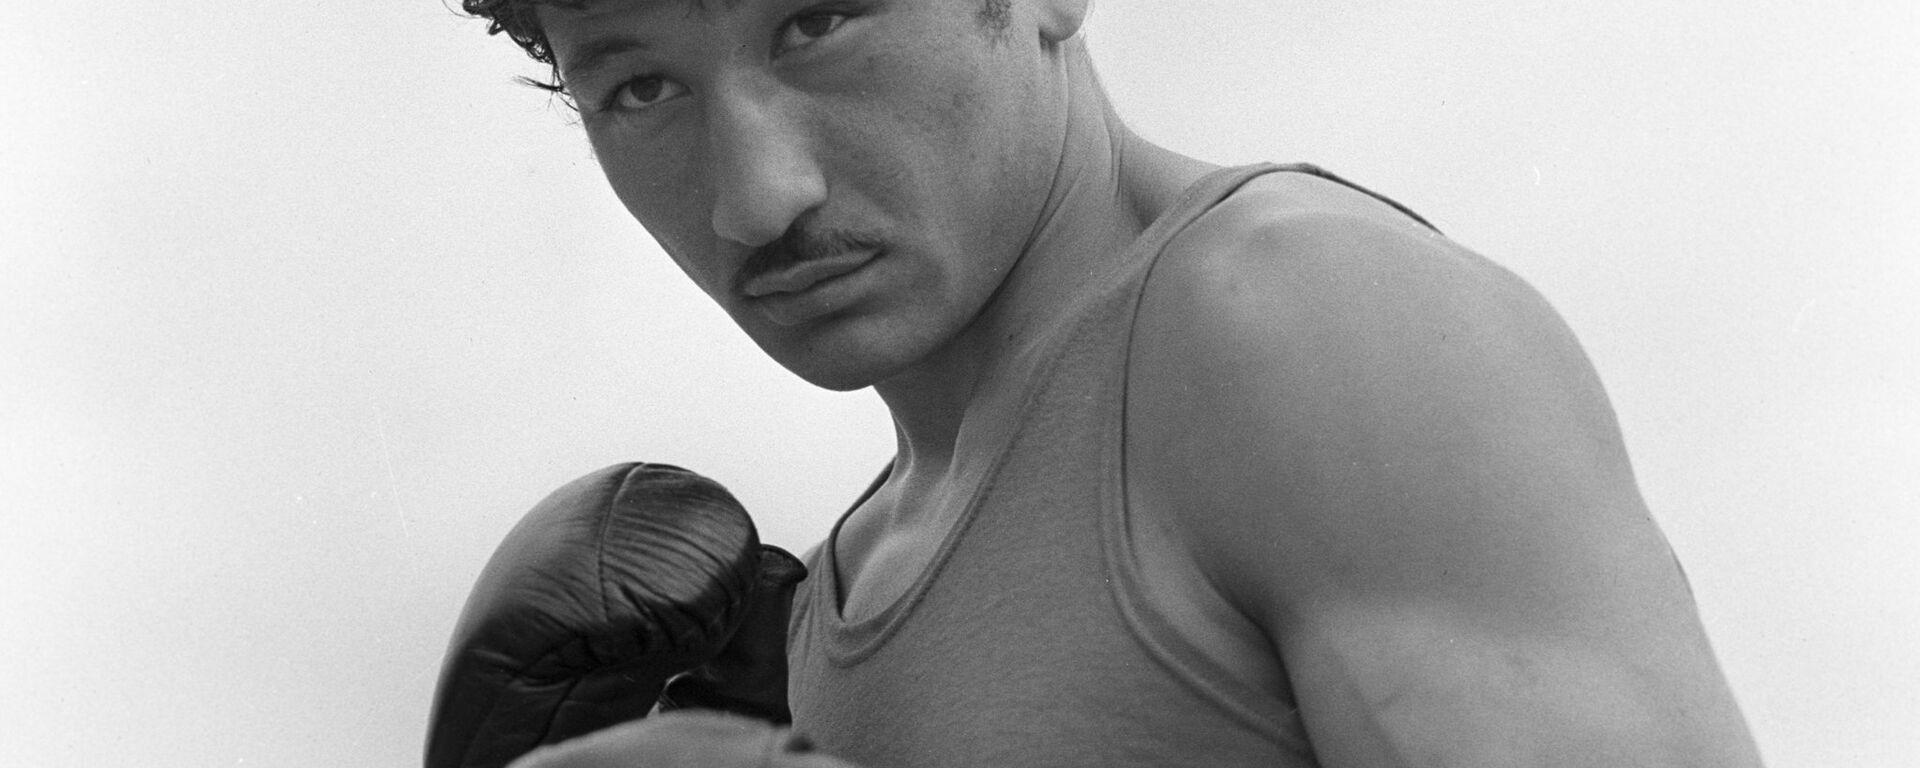 Узбекский боксер Руфат Рискиев - Sputnik Узбекистан, 1920, 22.11.2016